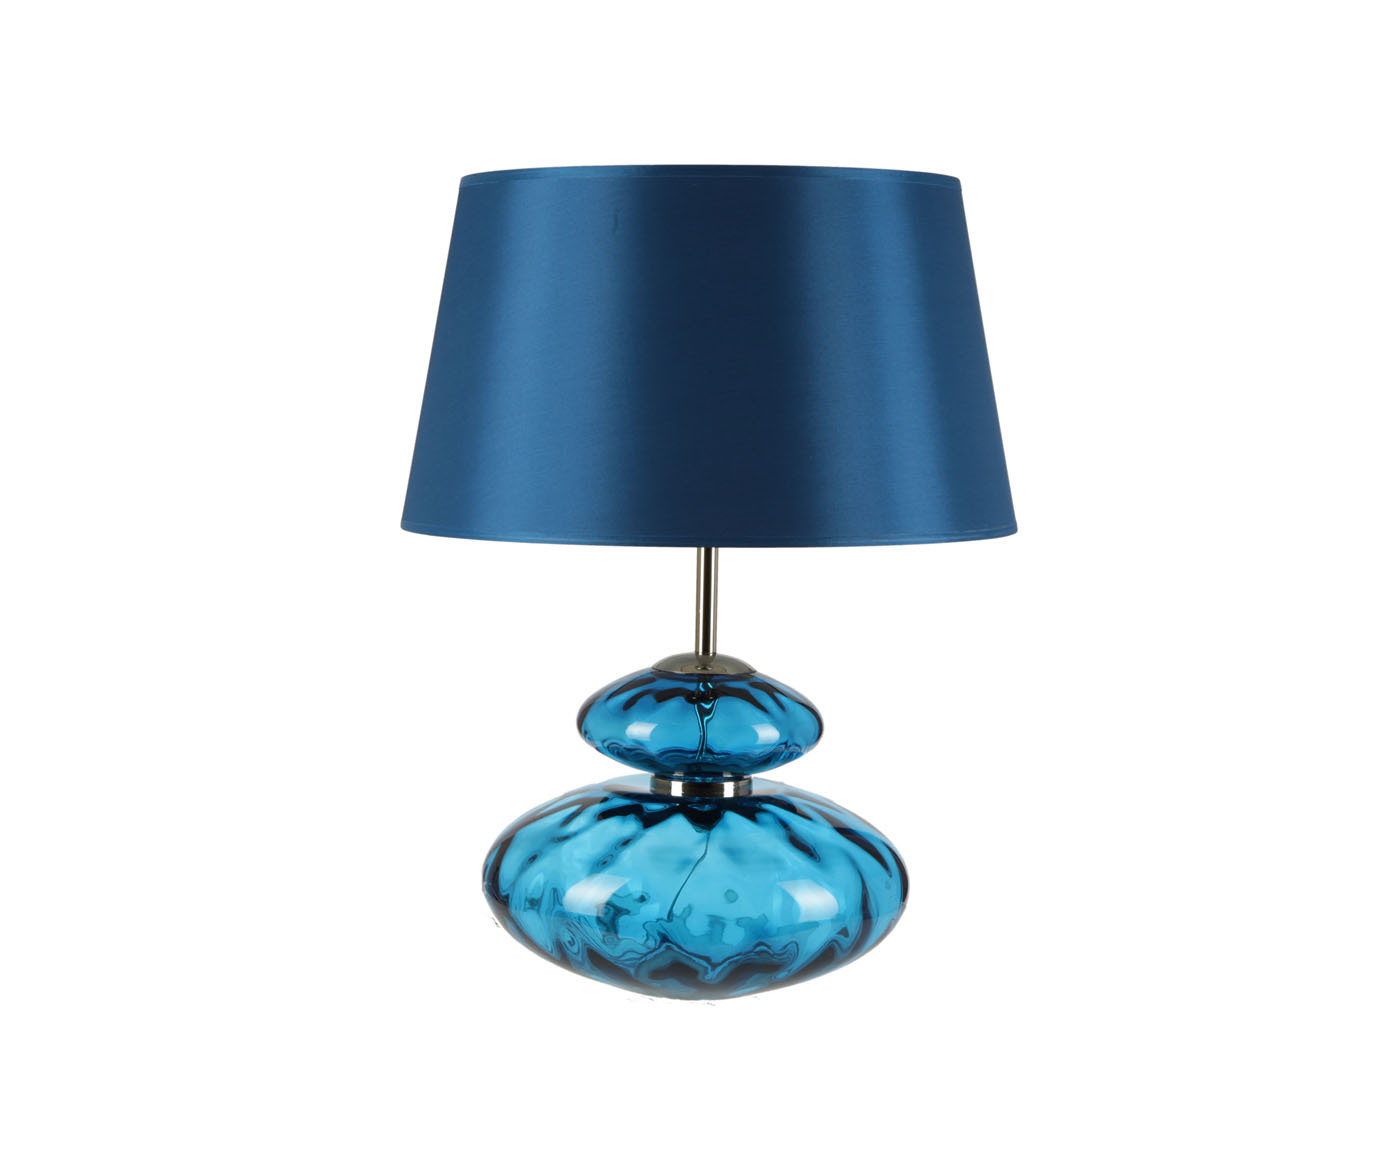 Лампы настольные Элитная лампа настольная Majestic Blue Bubble от Crisbase elitnaya-lampa-nastolnaya-p2873indigo-ot-sporvil-portugaliya.jpg